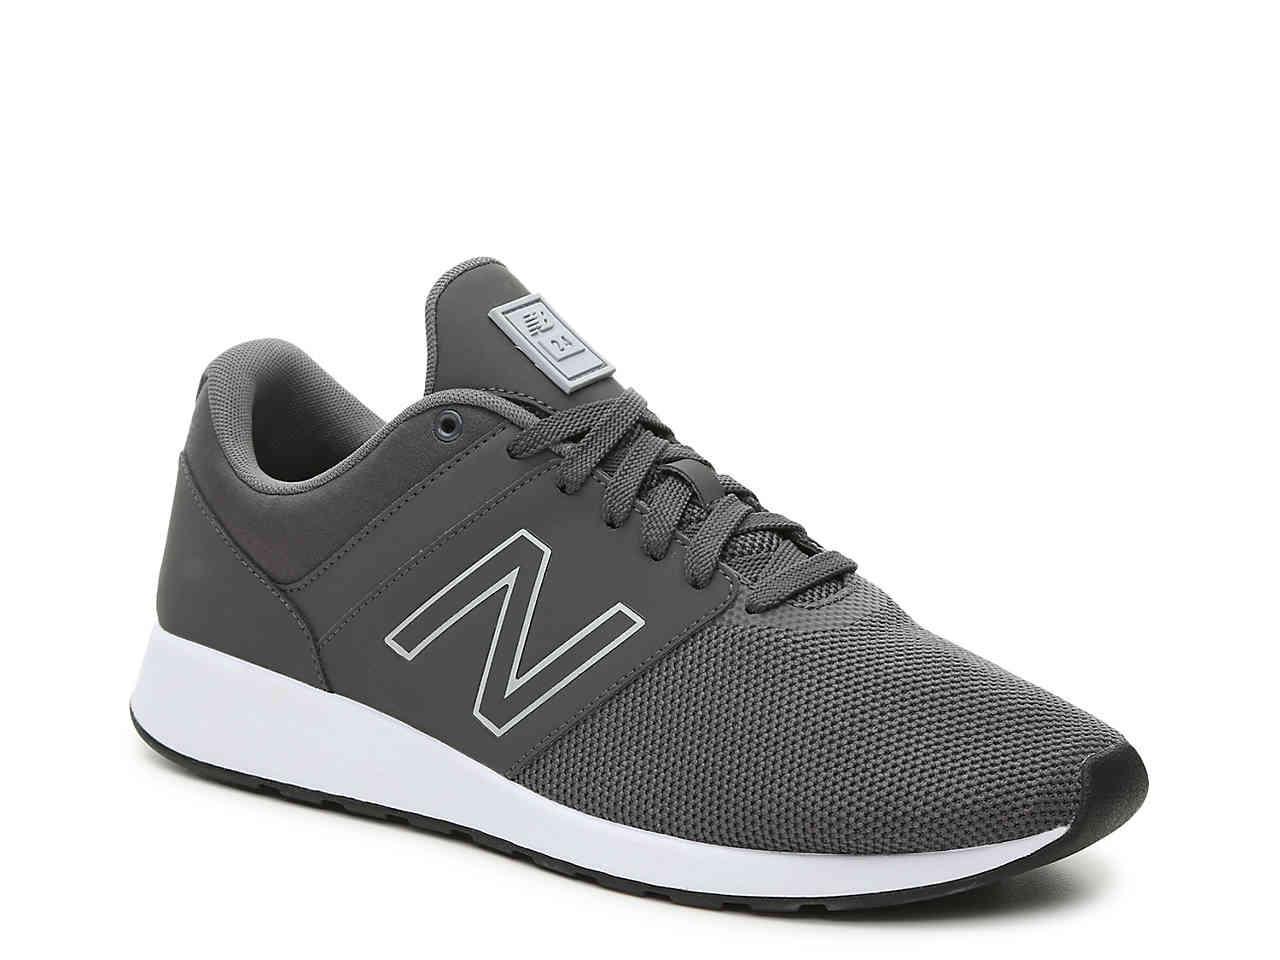 New Balance 1260 low